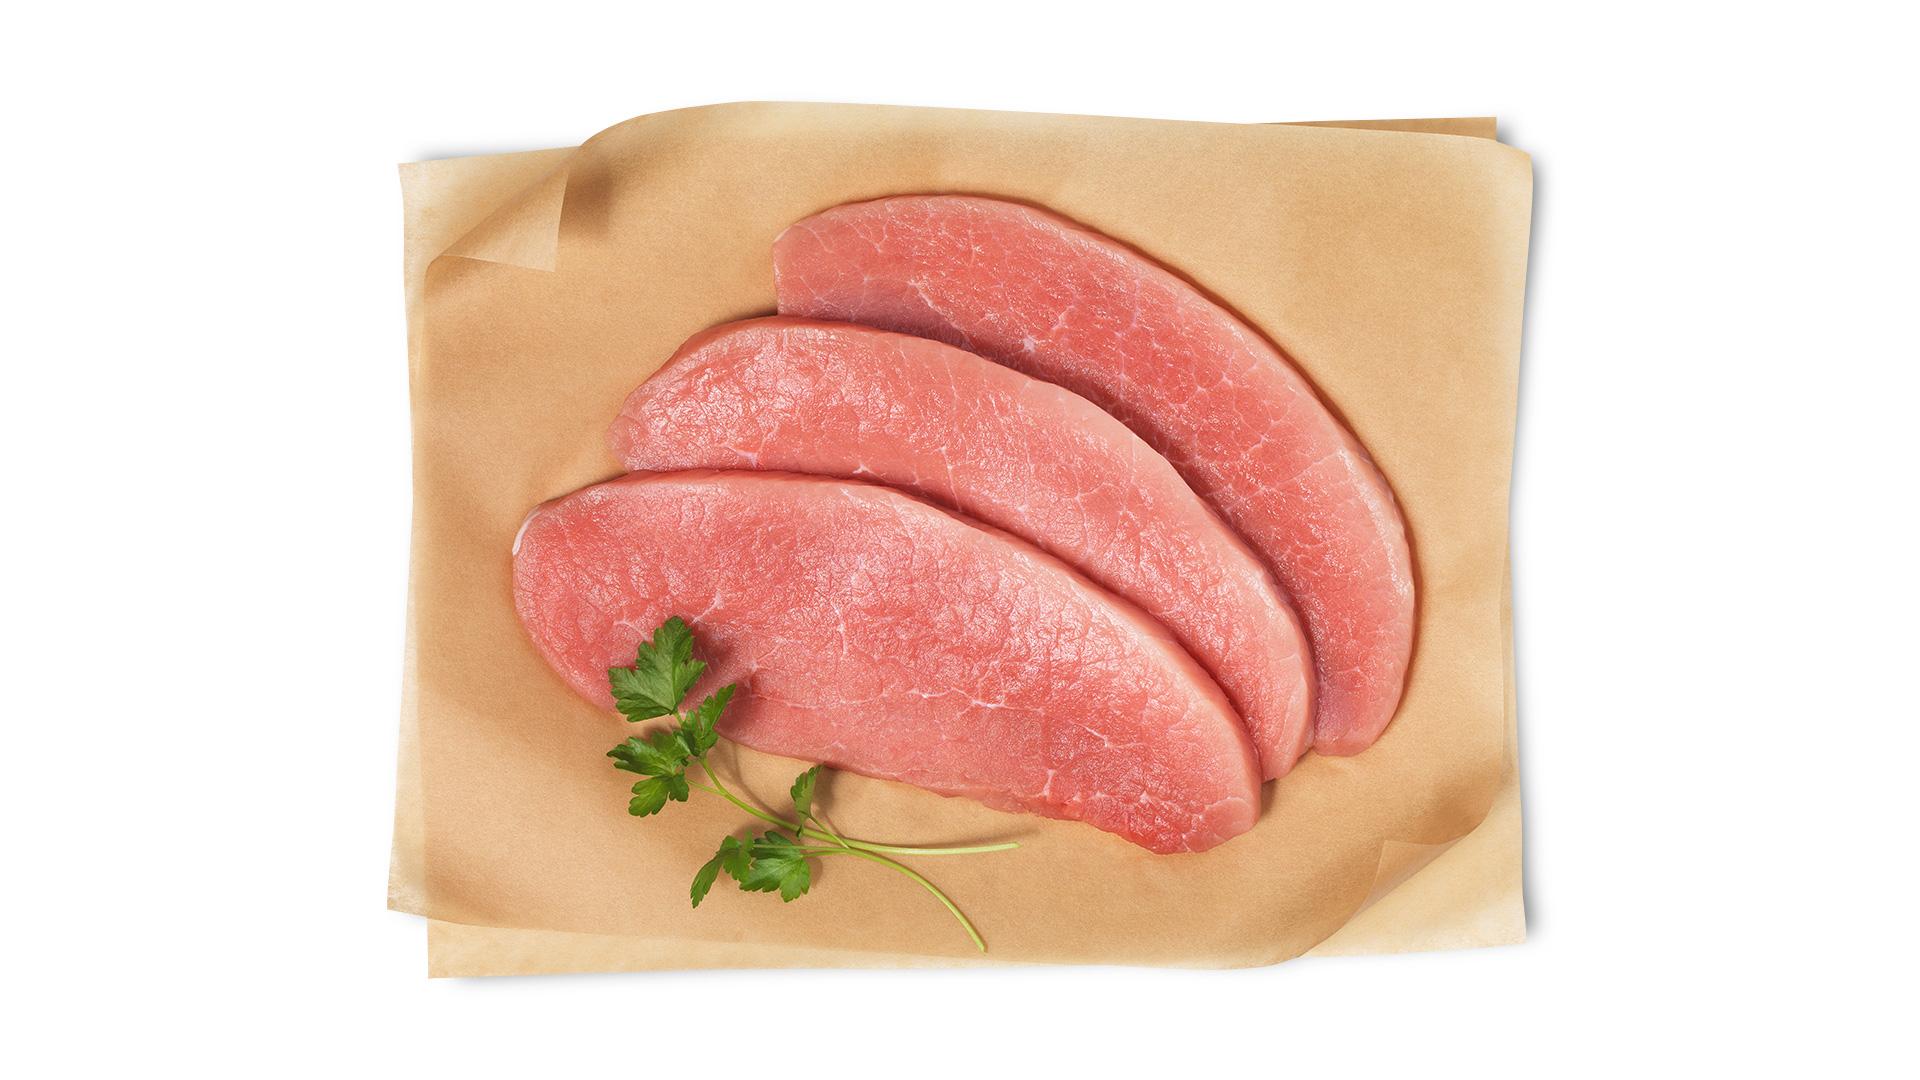 Hofstädter Schweinsschnitzel geschnitten